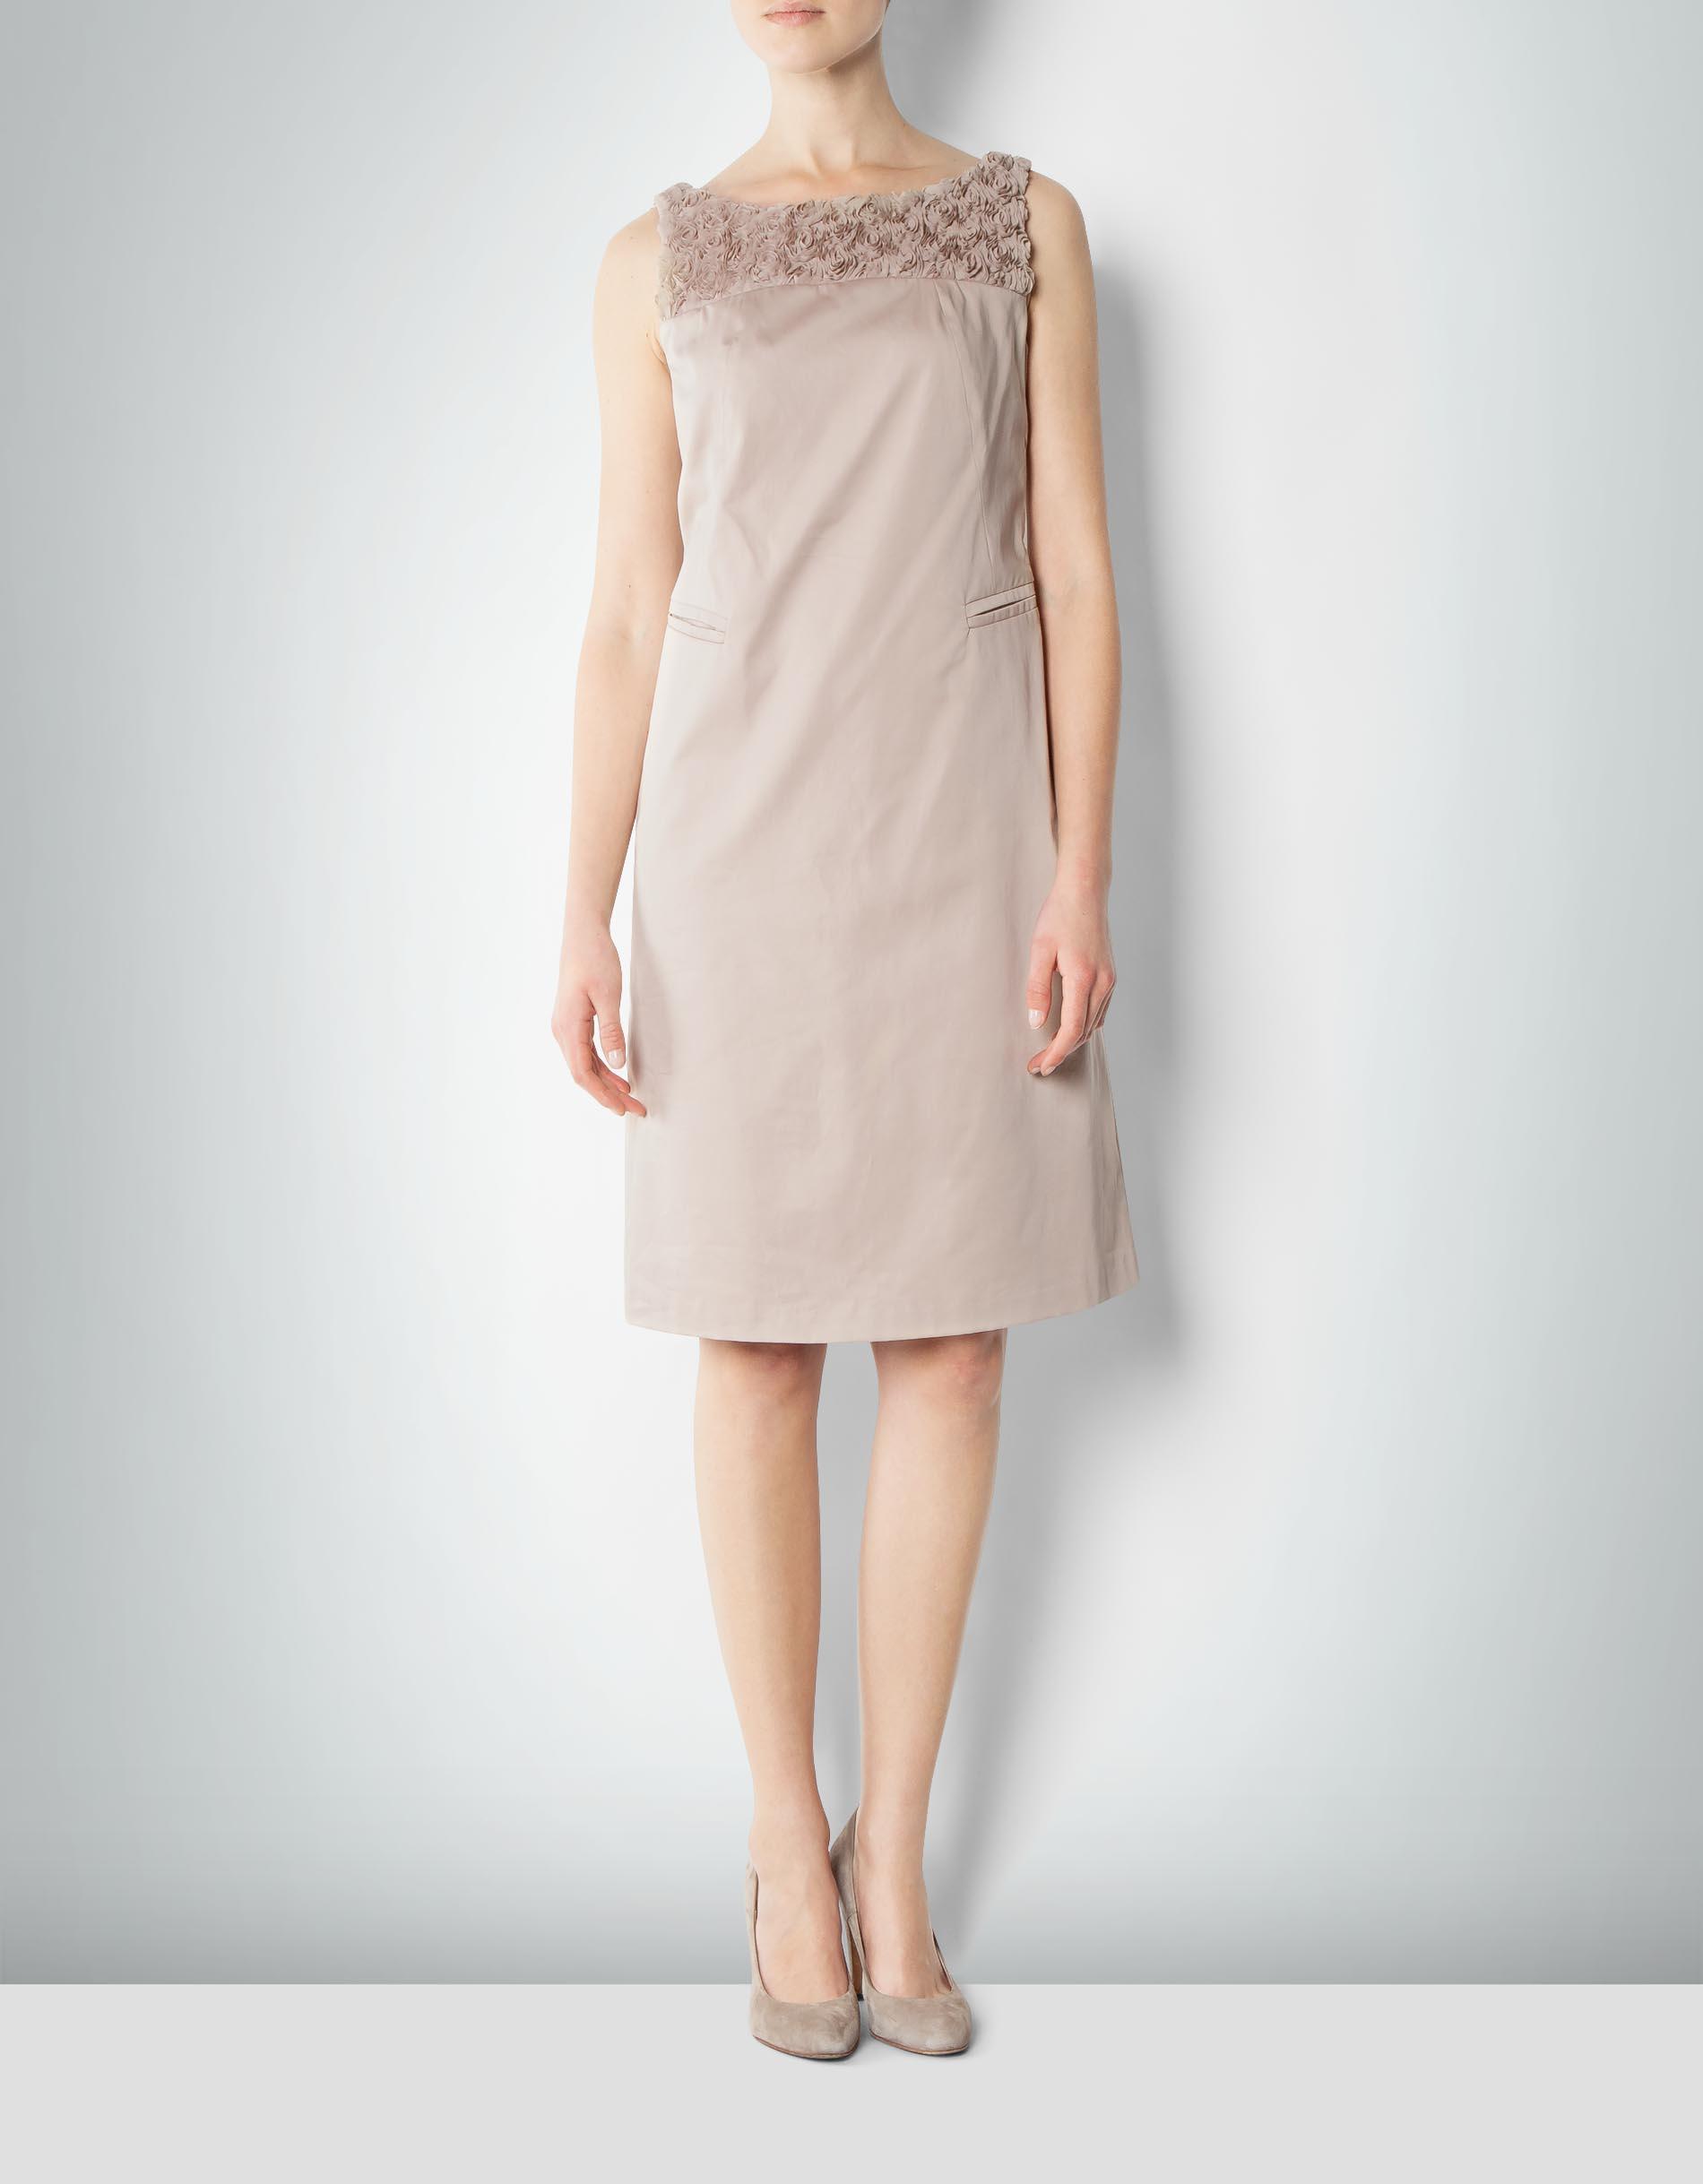 daniel hechter damen kleid beige mit rosen drap s. Black Bedroom Furniture Sets. Home Design Ideas